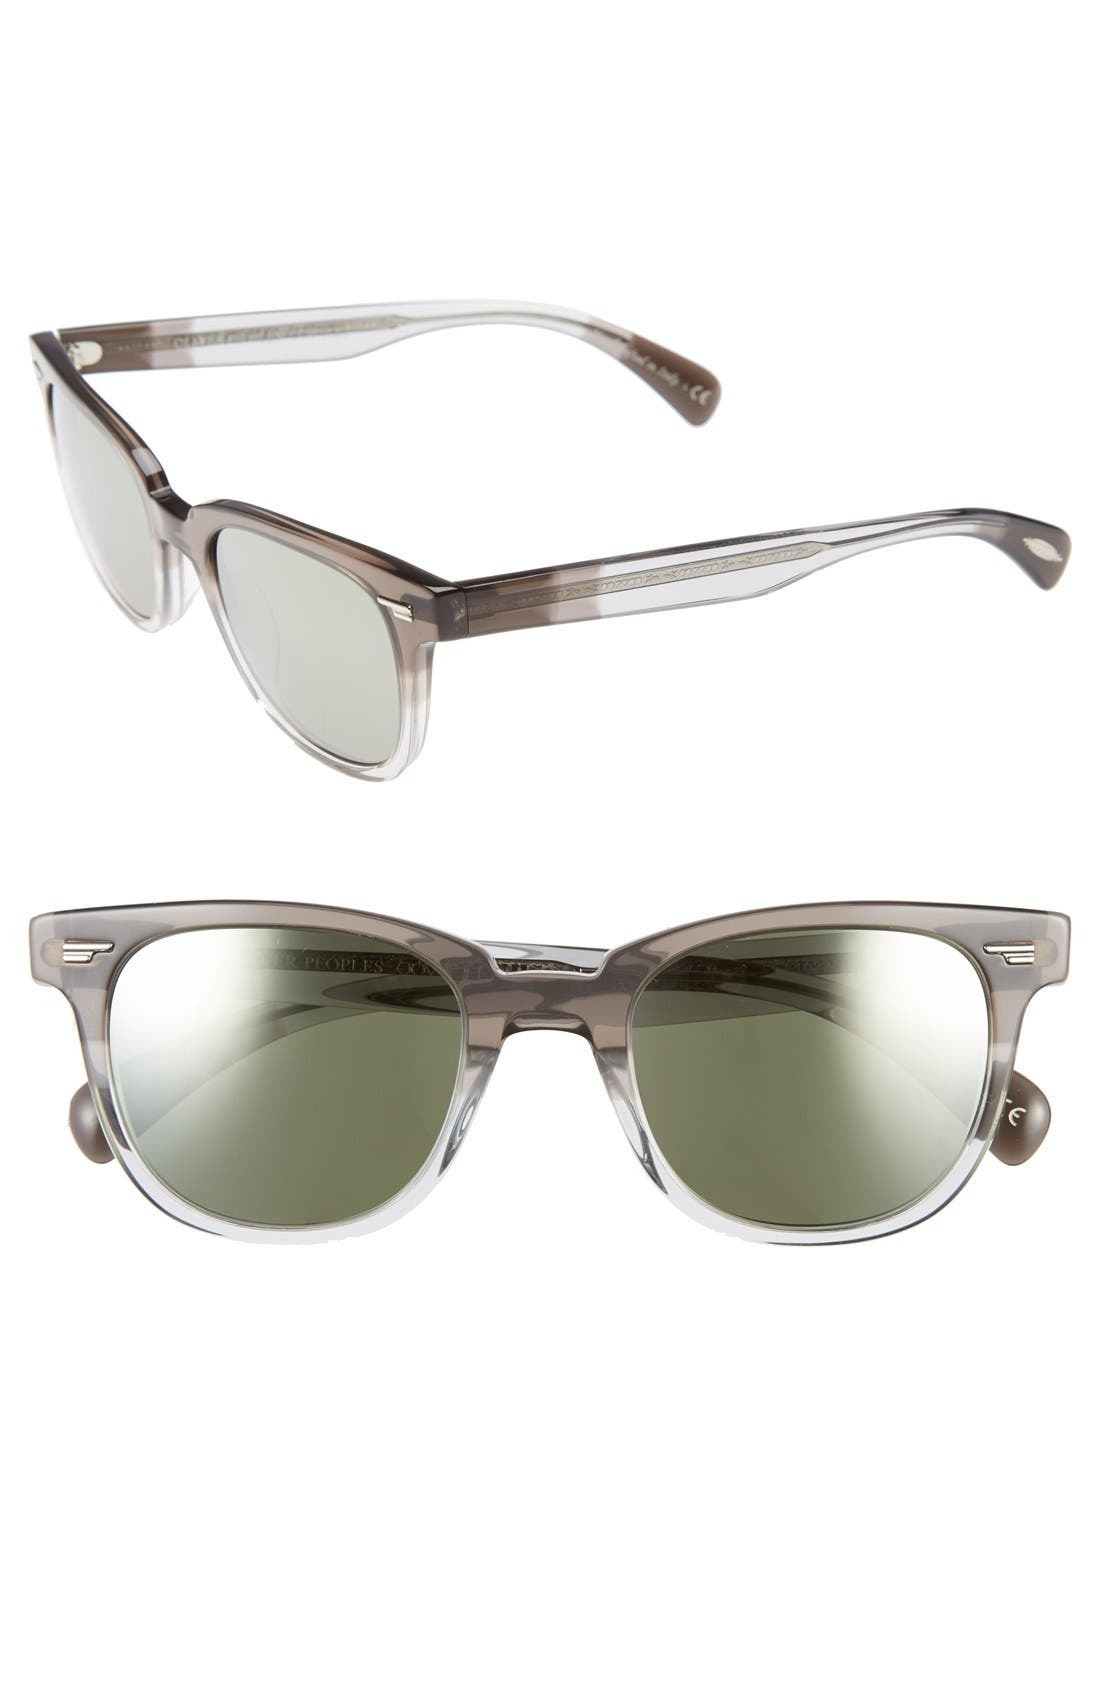 'Masek' 51mm Retro Sunglasses,                             Main thumbnail 1, color,                             020